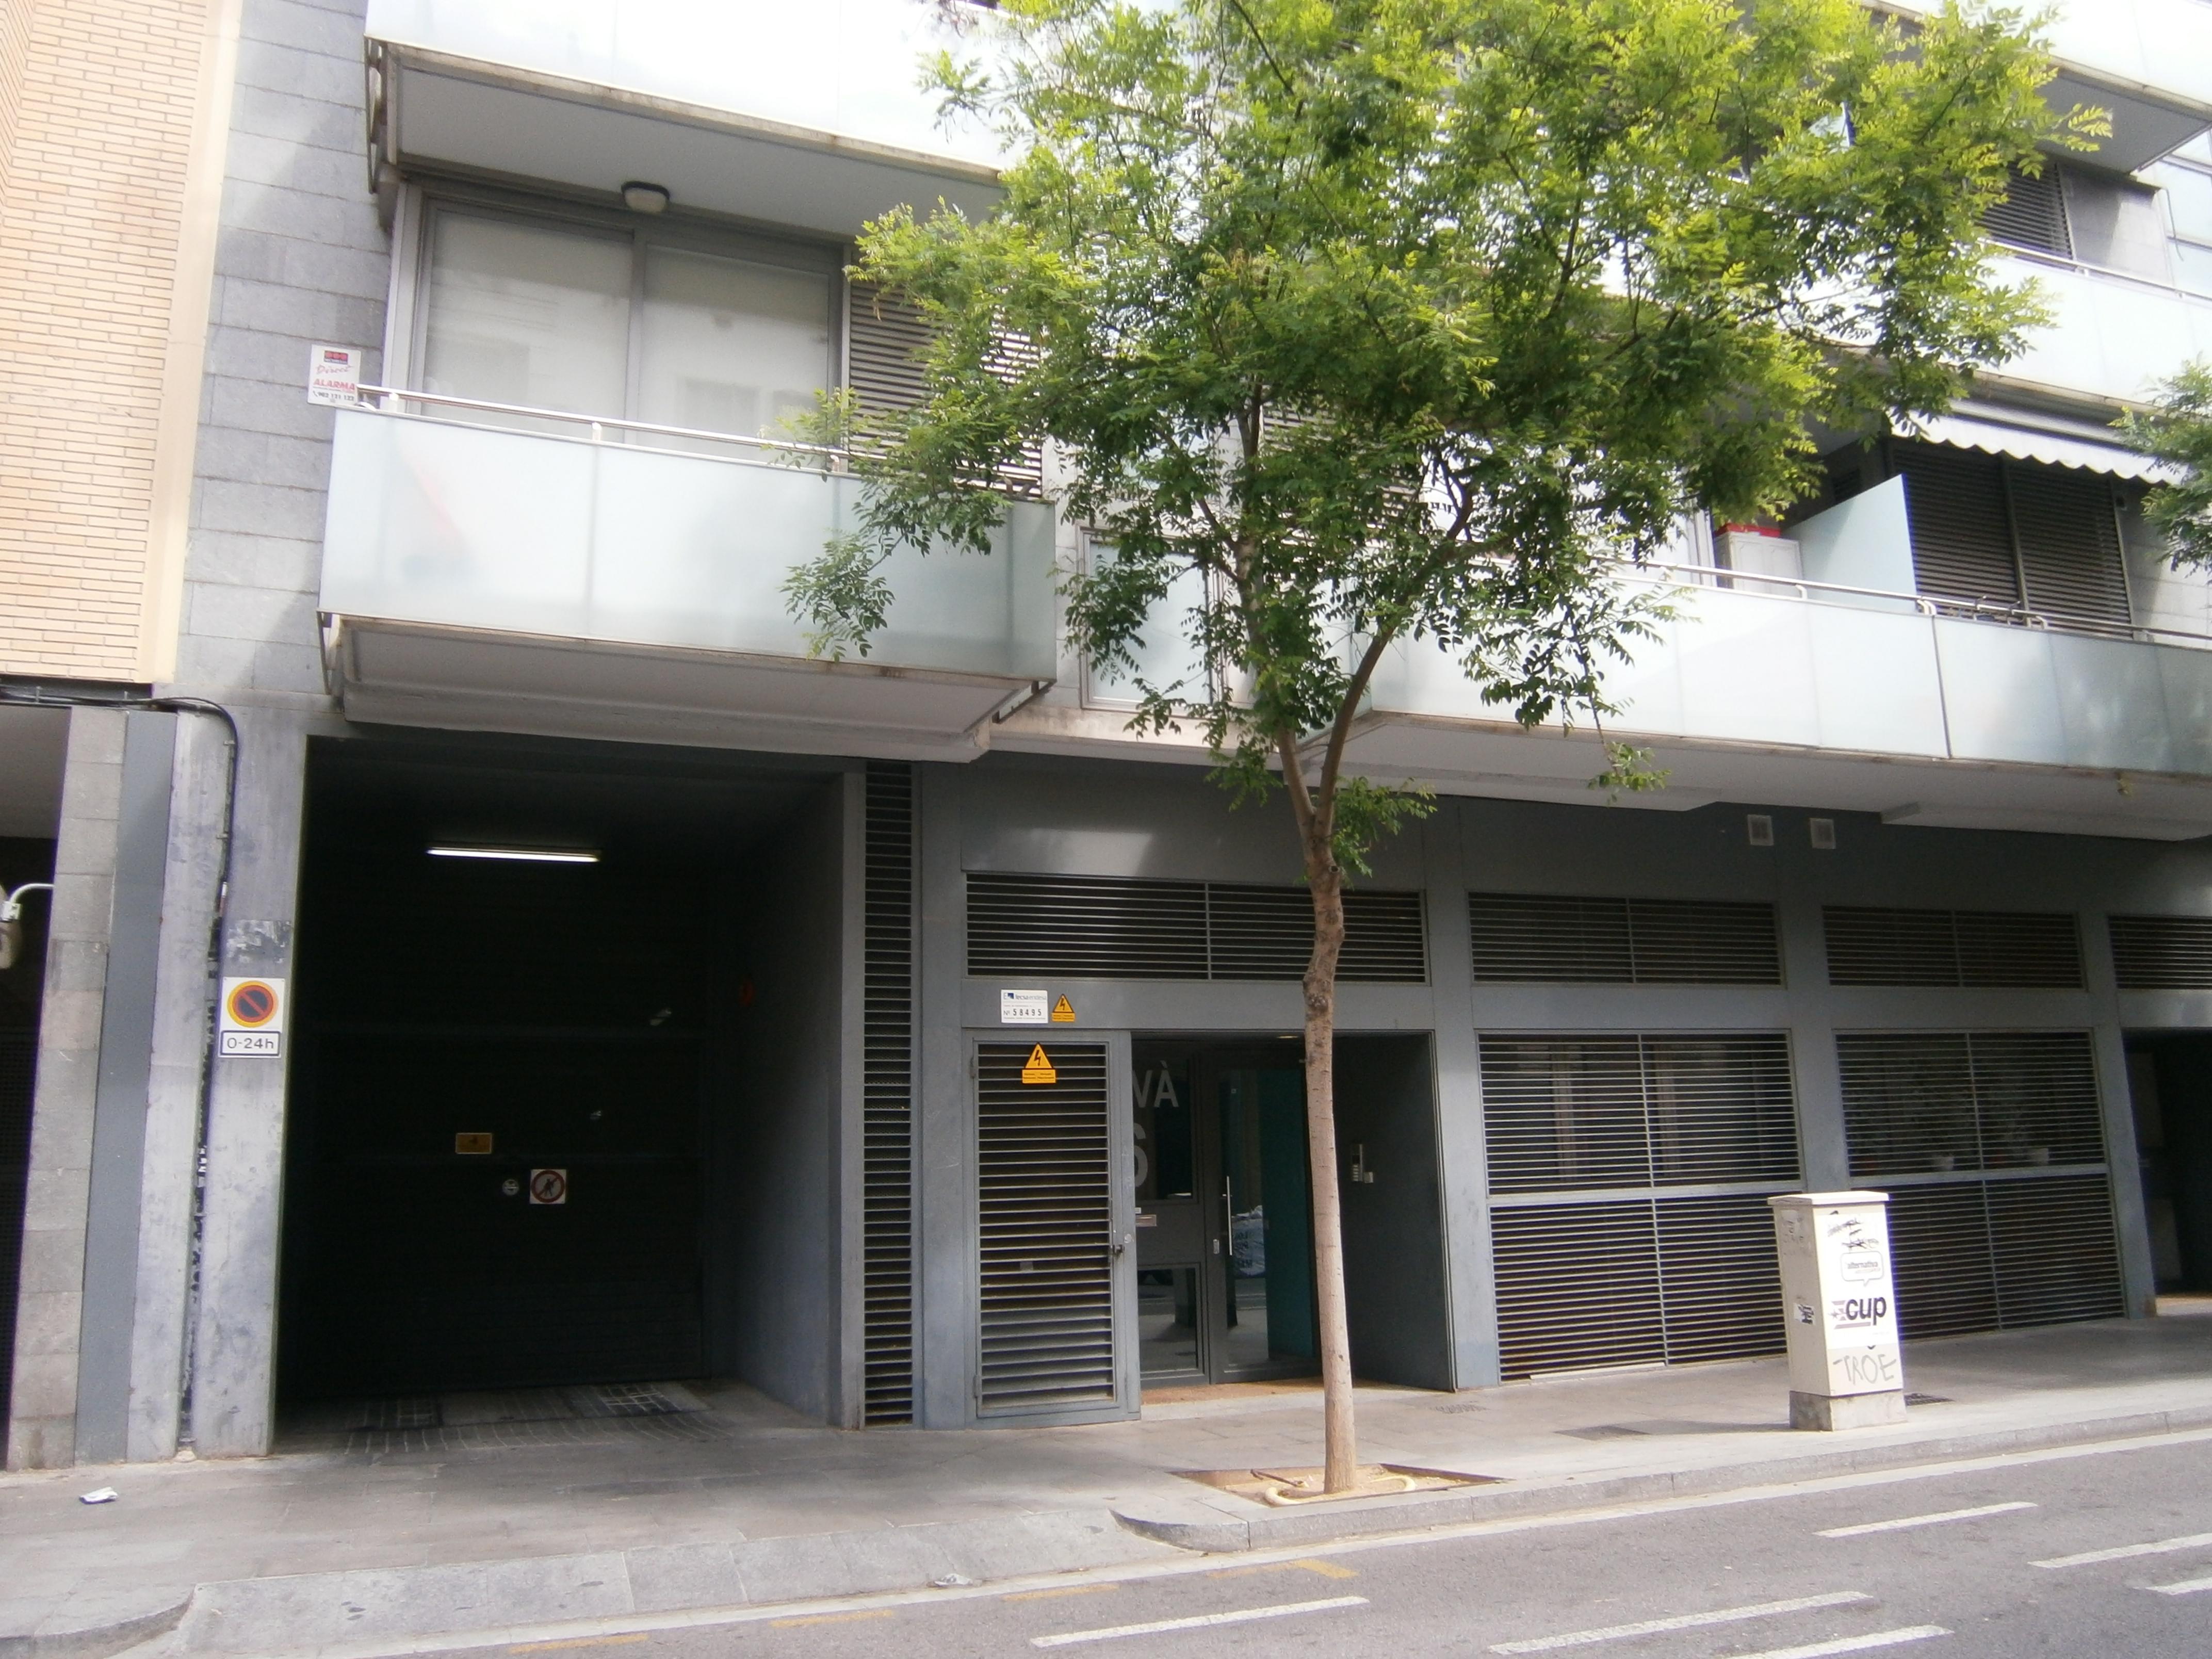 Plaza garaje coche en venta o alquiler for Alquiler garaje